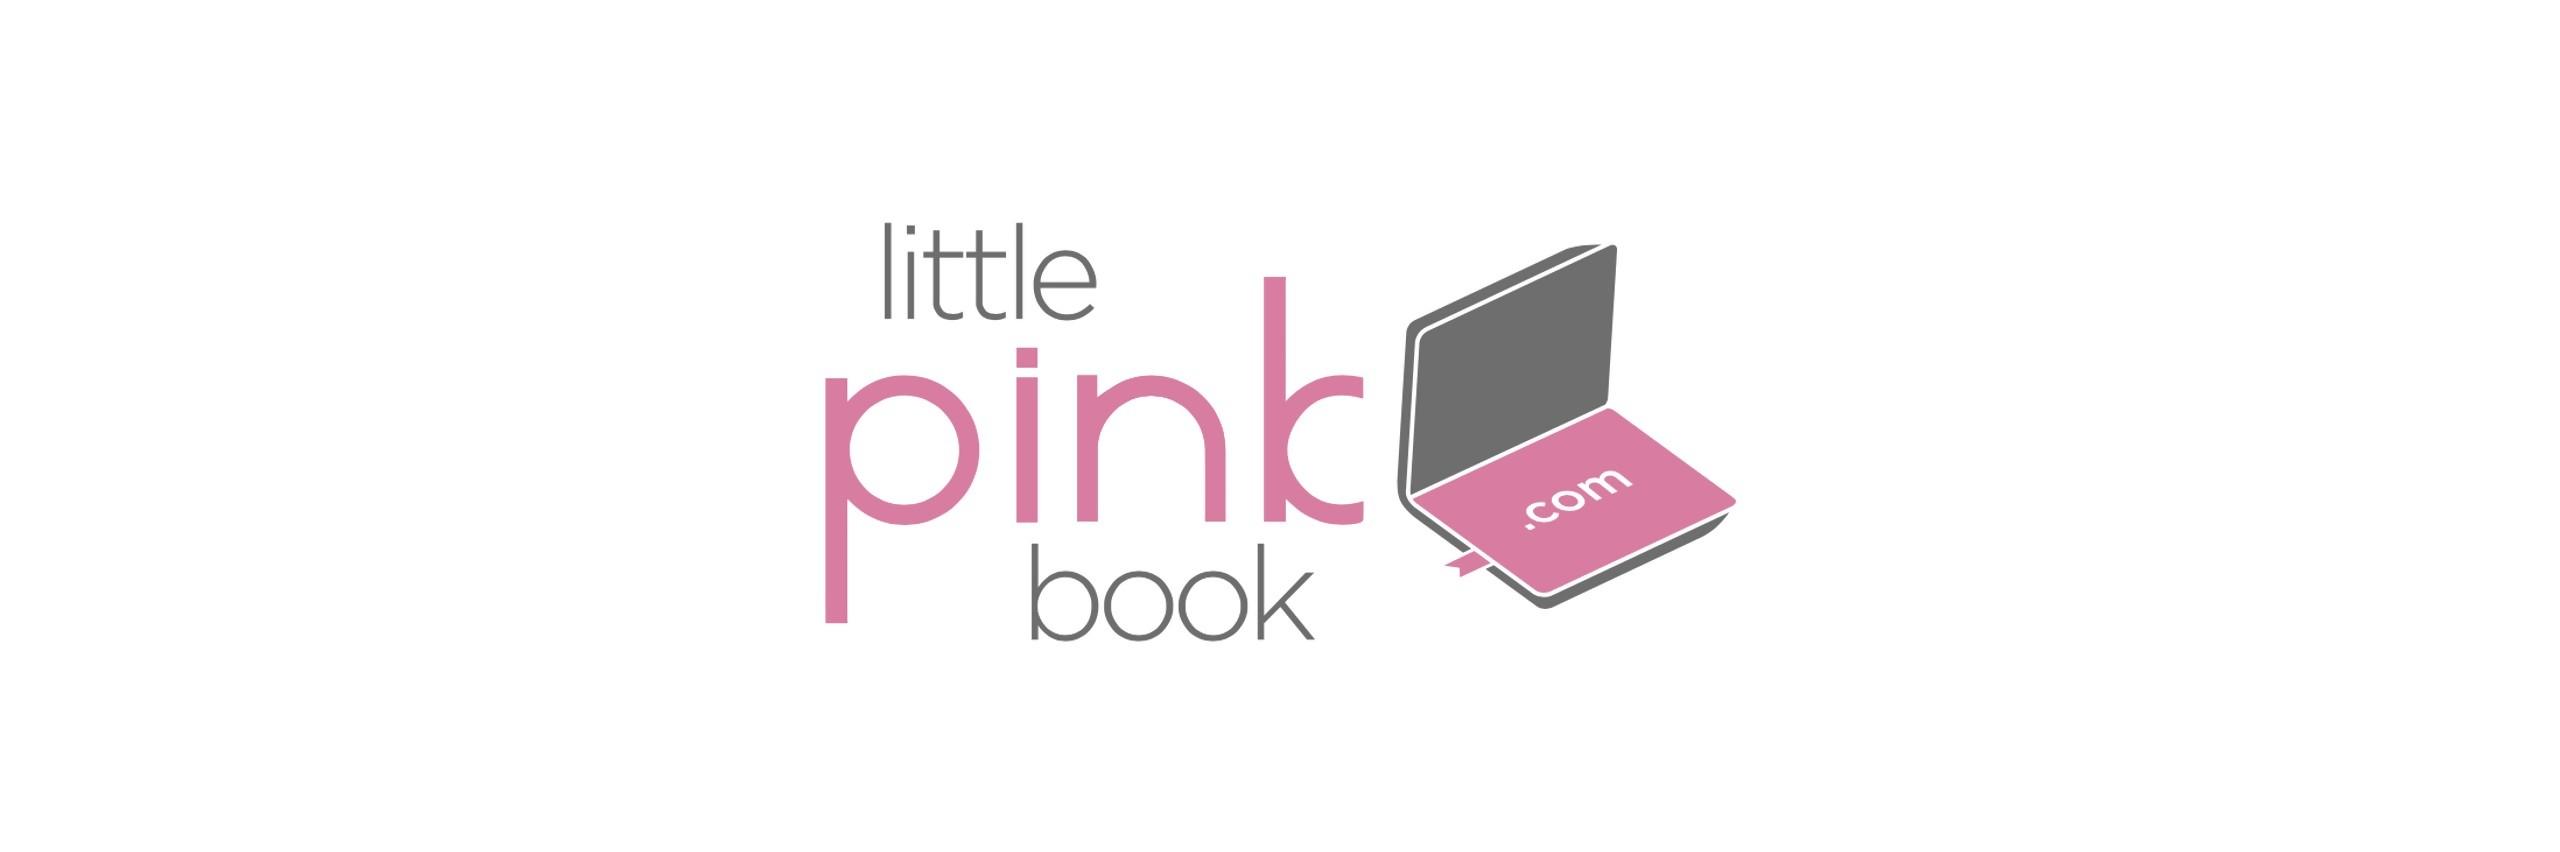 PINK'S SIGNATURE SPRING EMPOWERMENT EVENT